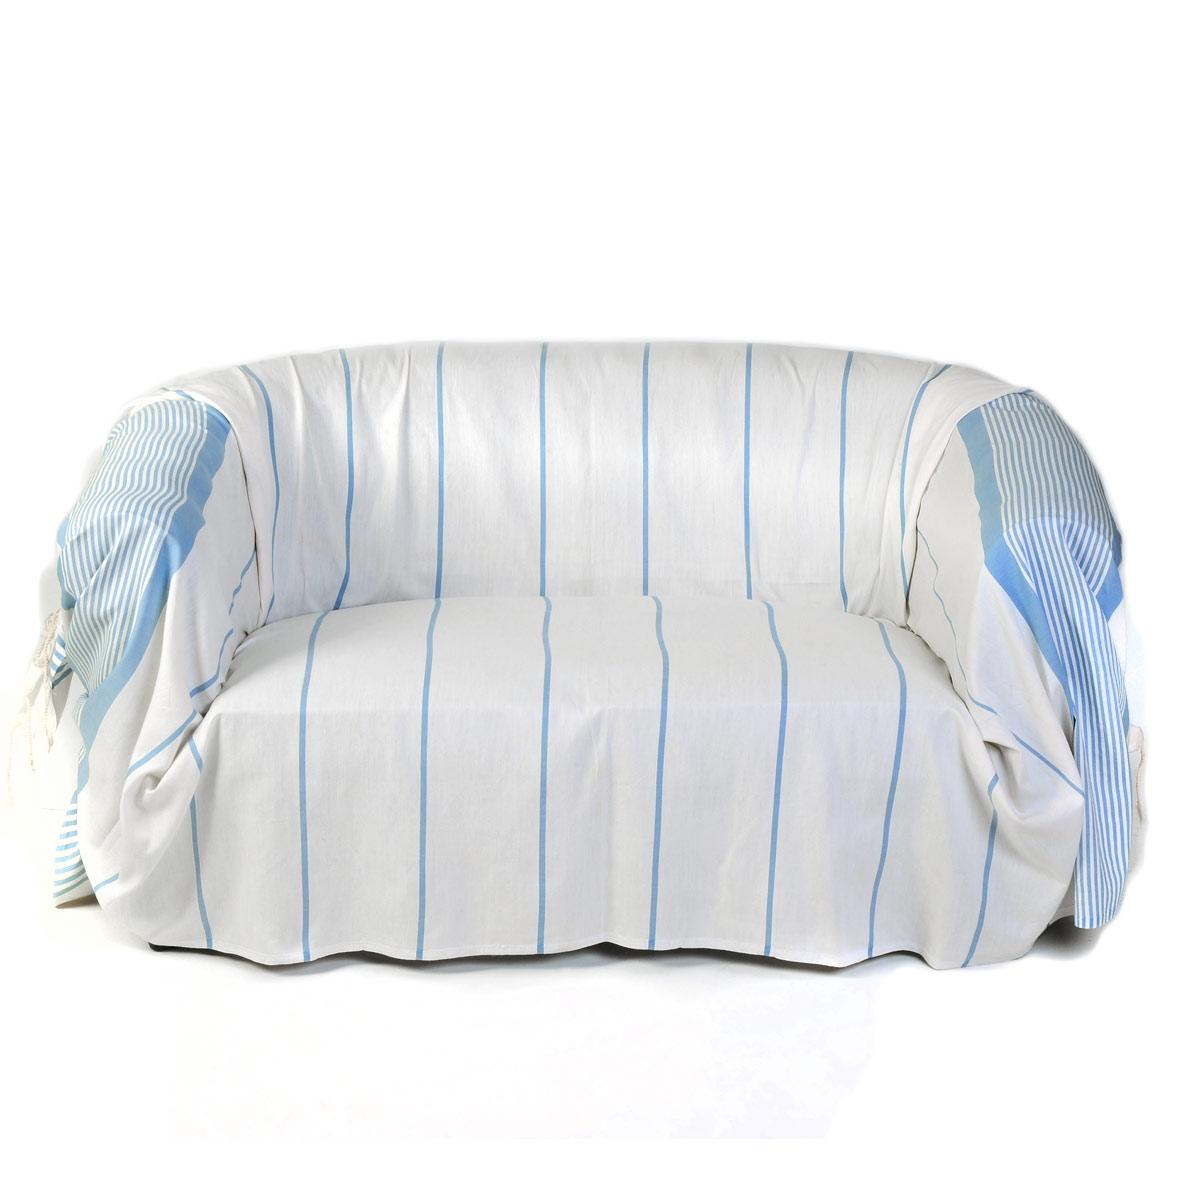 CARTHAGE - Jeté de canapé 100% coton blanc rayures bleu 200 x 300